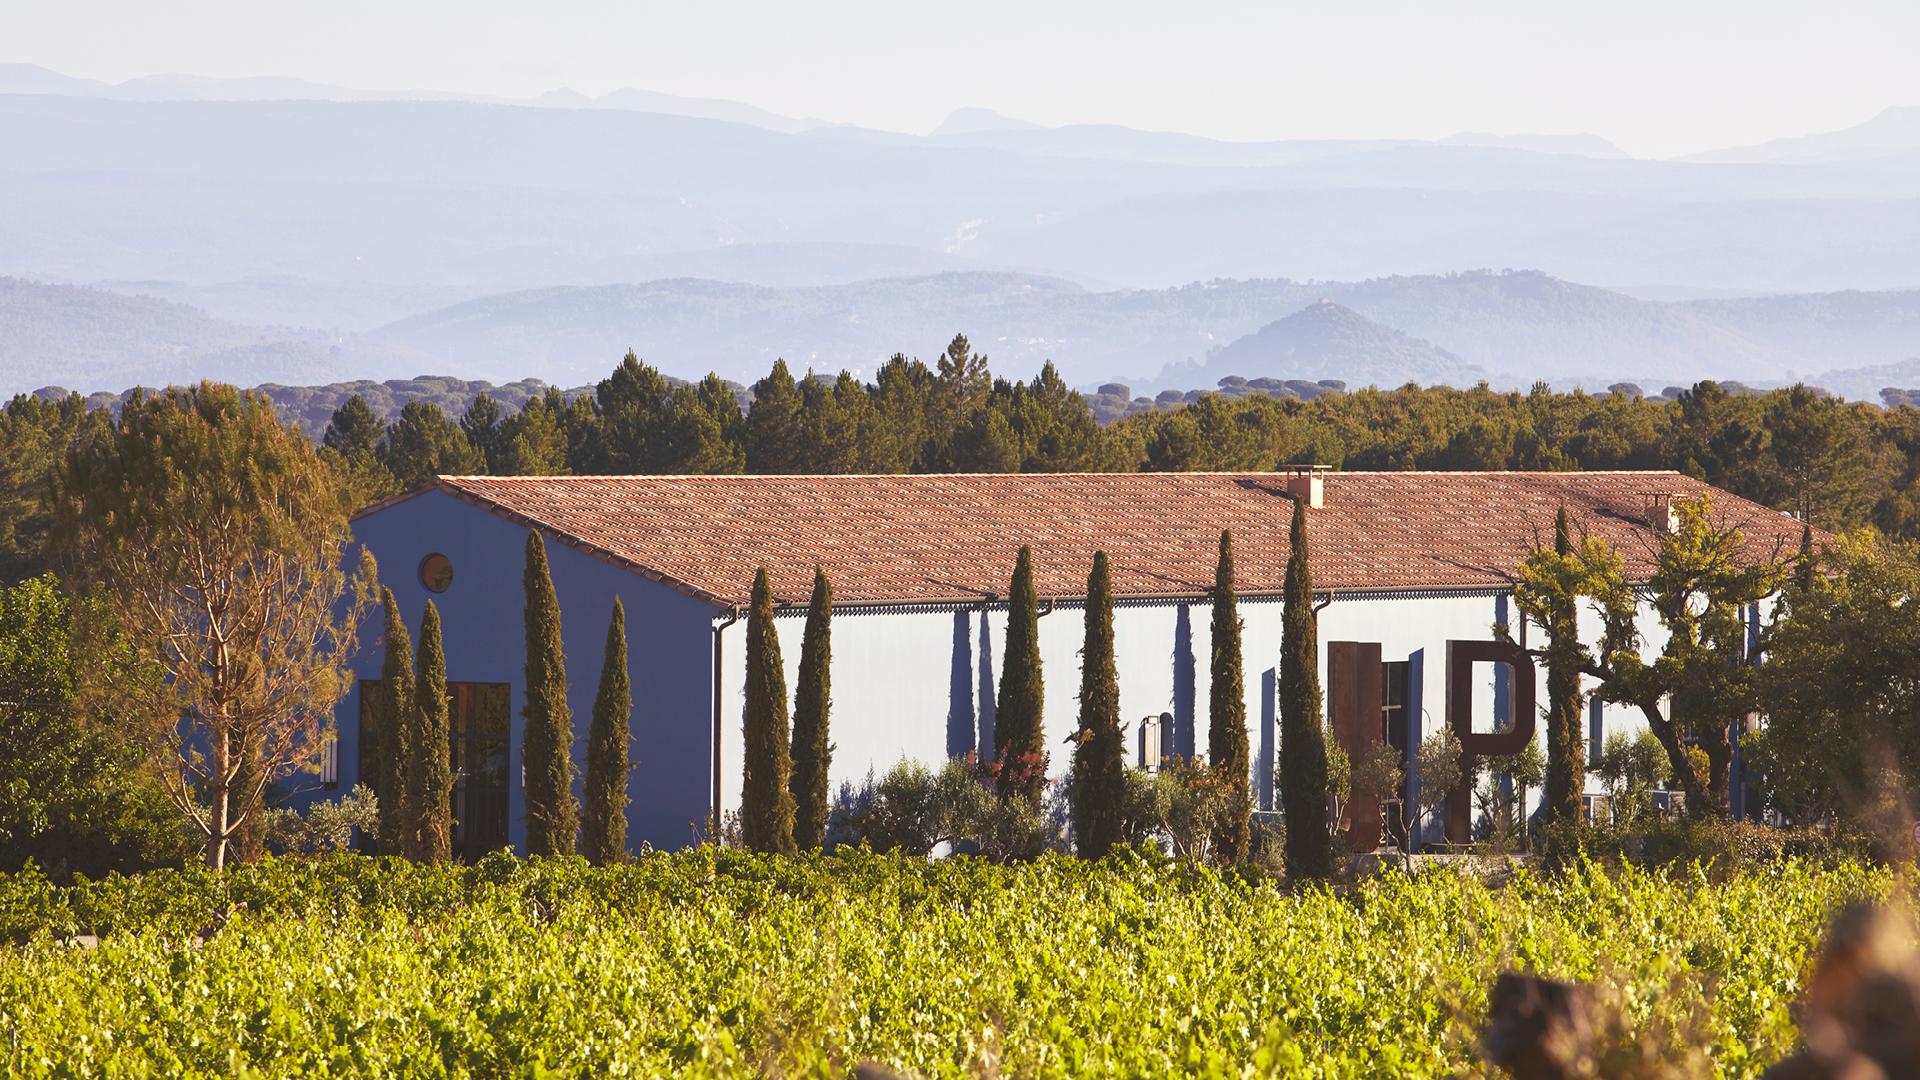 The Ultimate Provence wine estate | Ultimate Provence | Humbert and Poyet | STIRworld